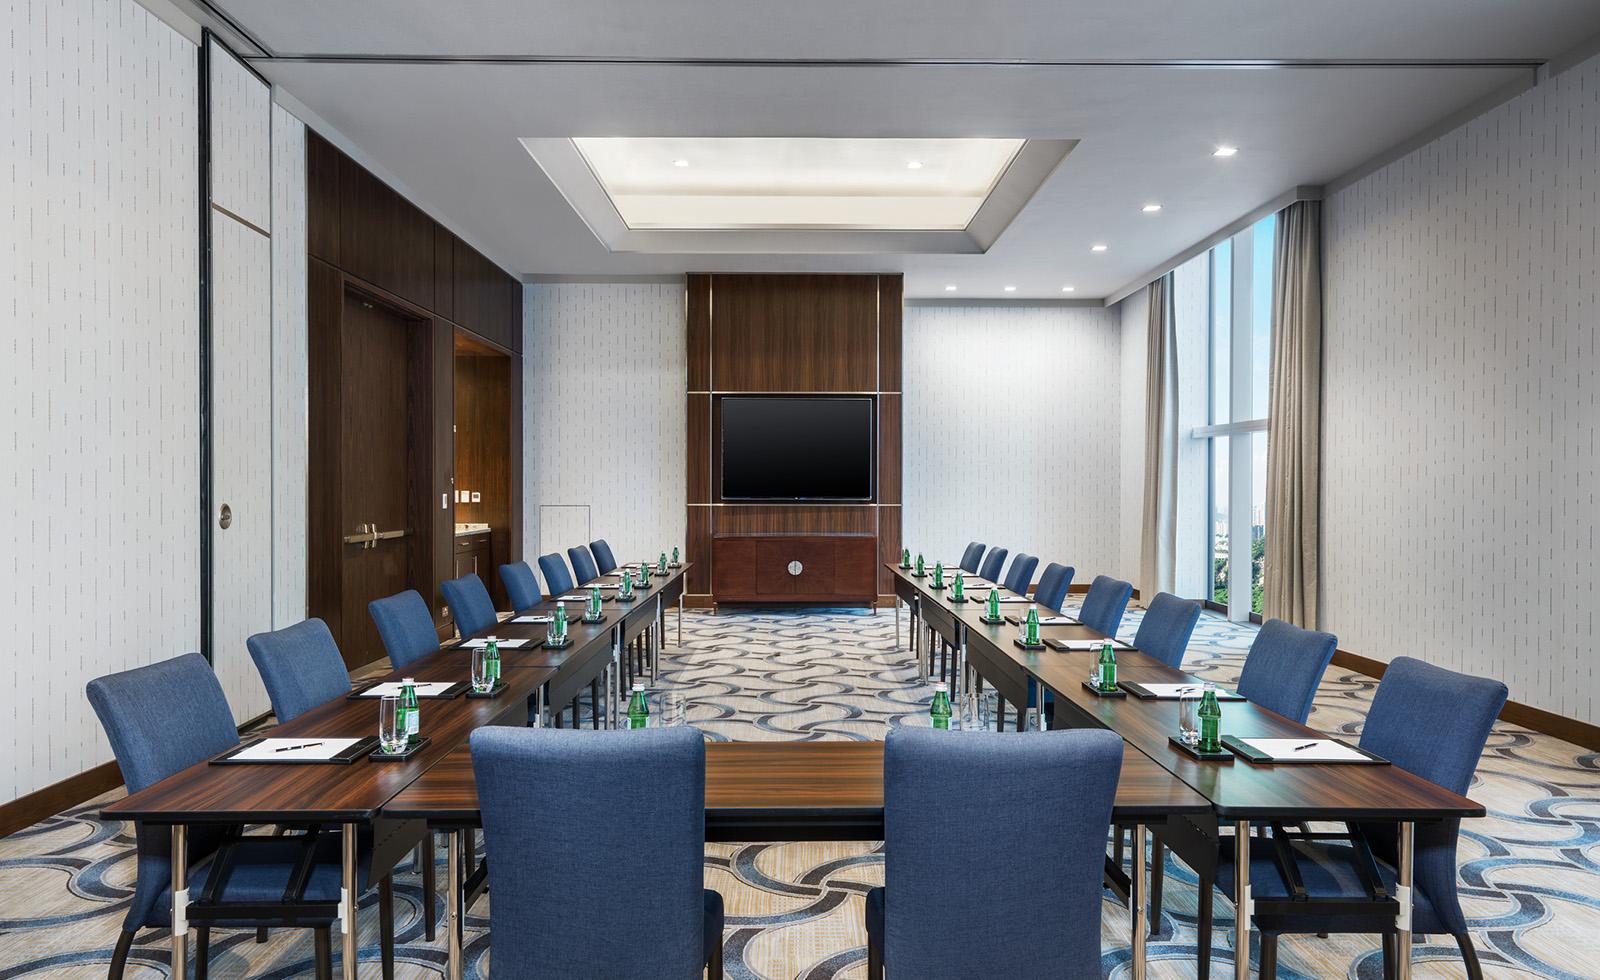 Amber meeting room, U-sharp setup